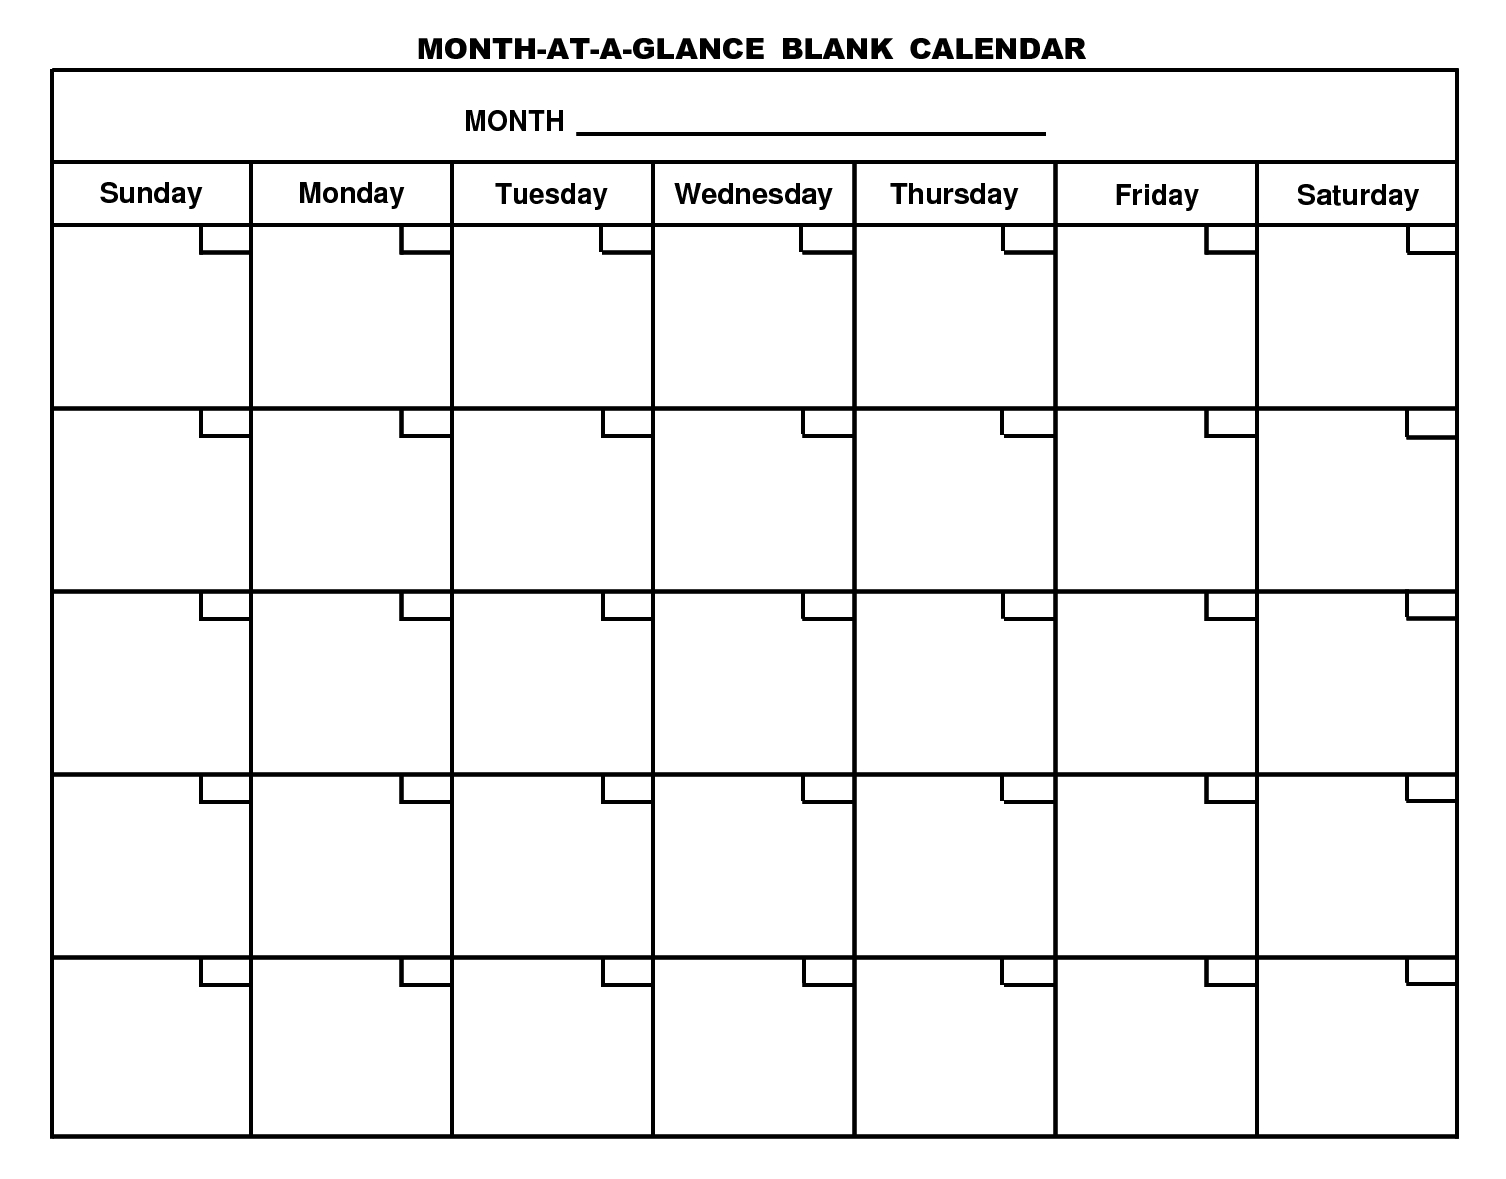 Free Printable Blank Monthly Calendar